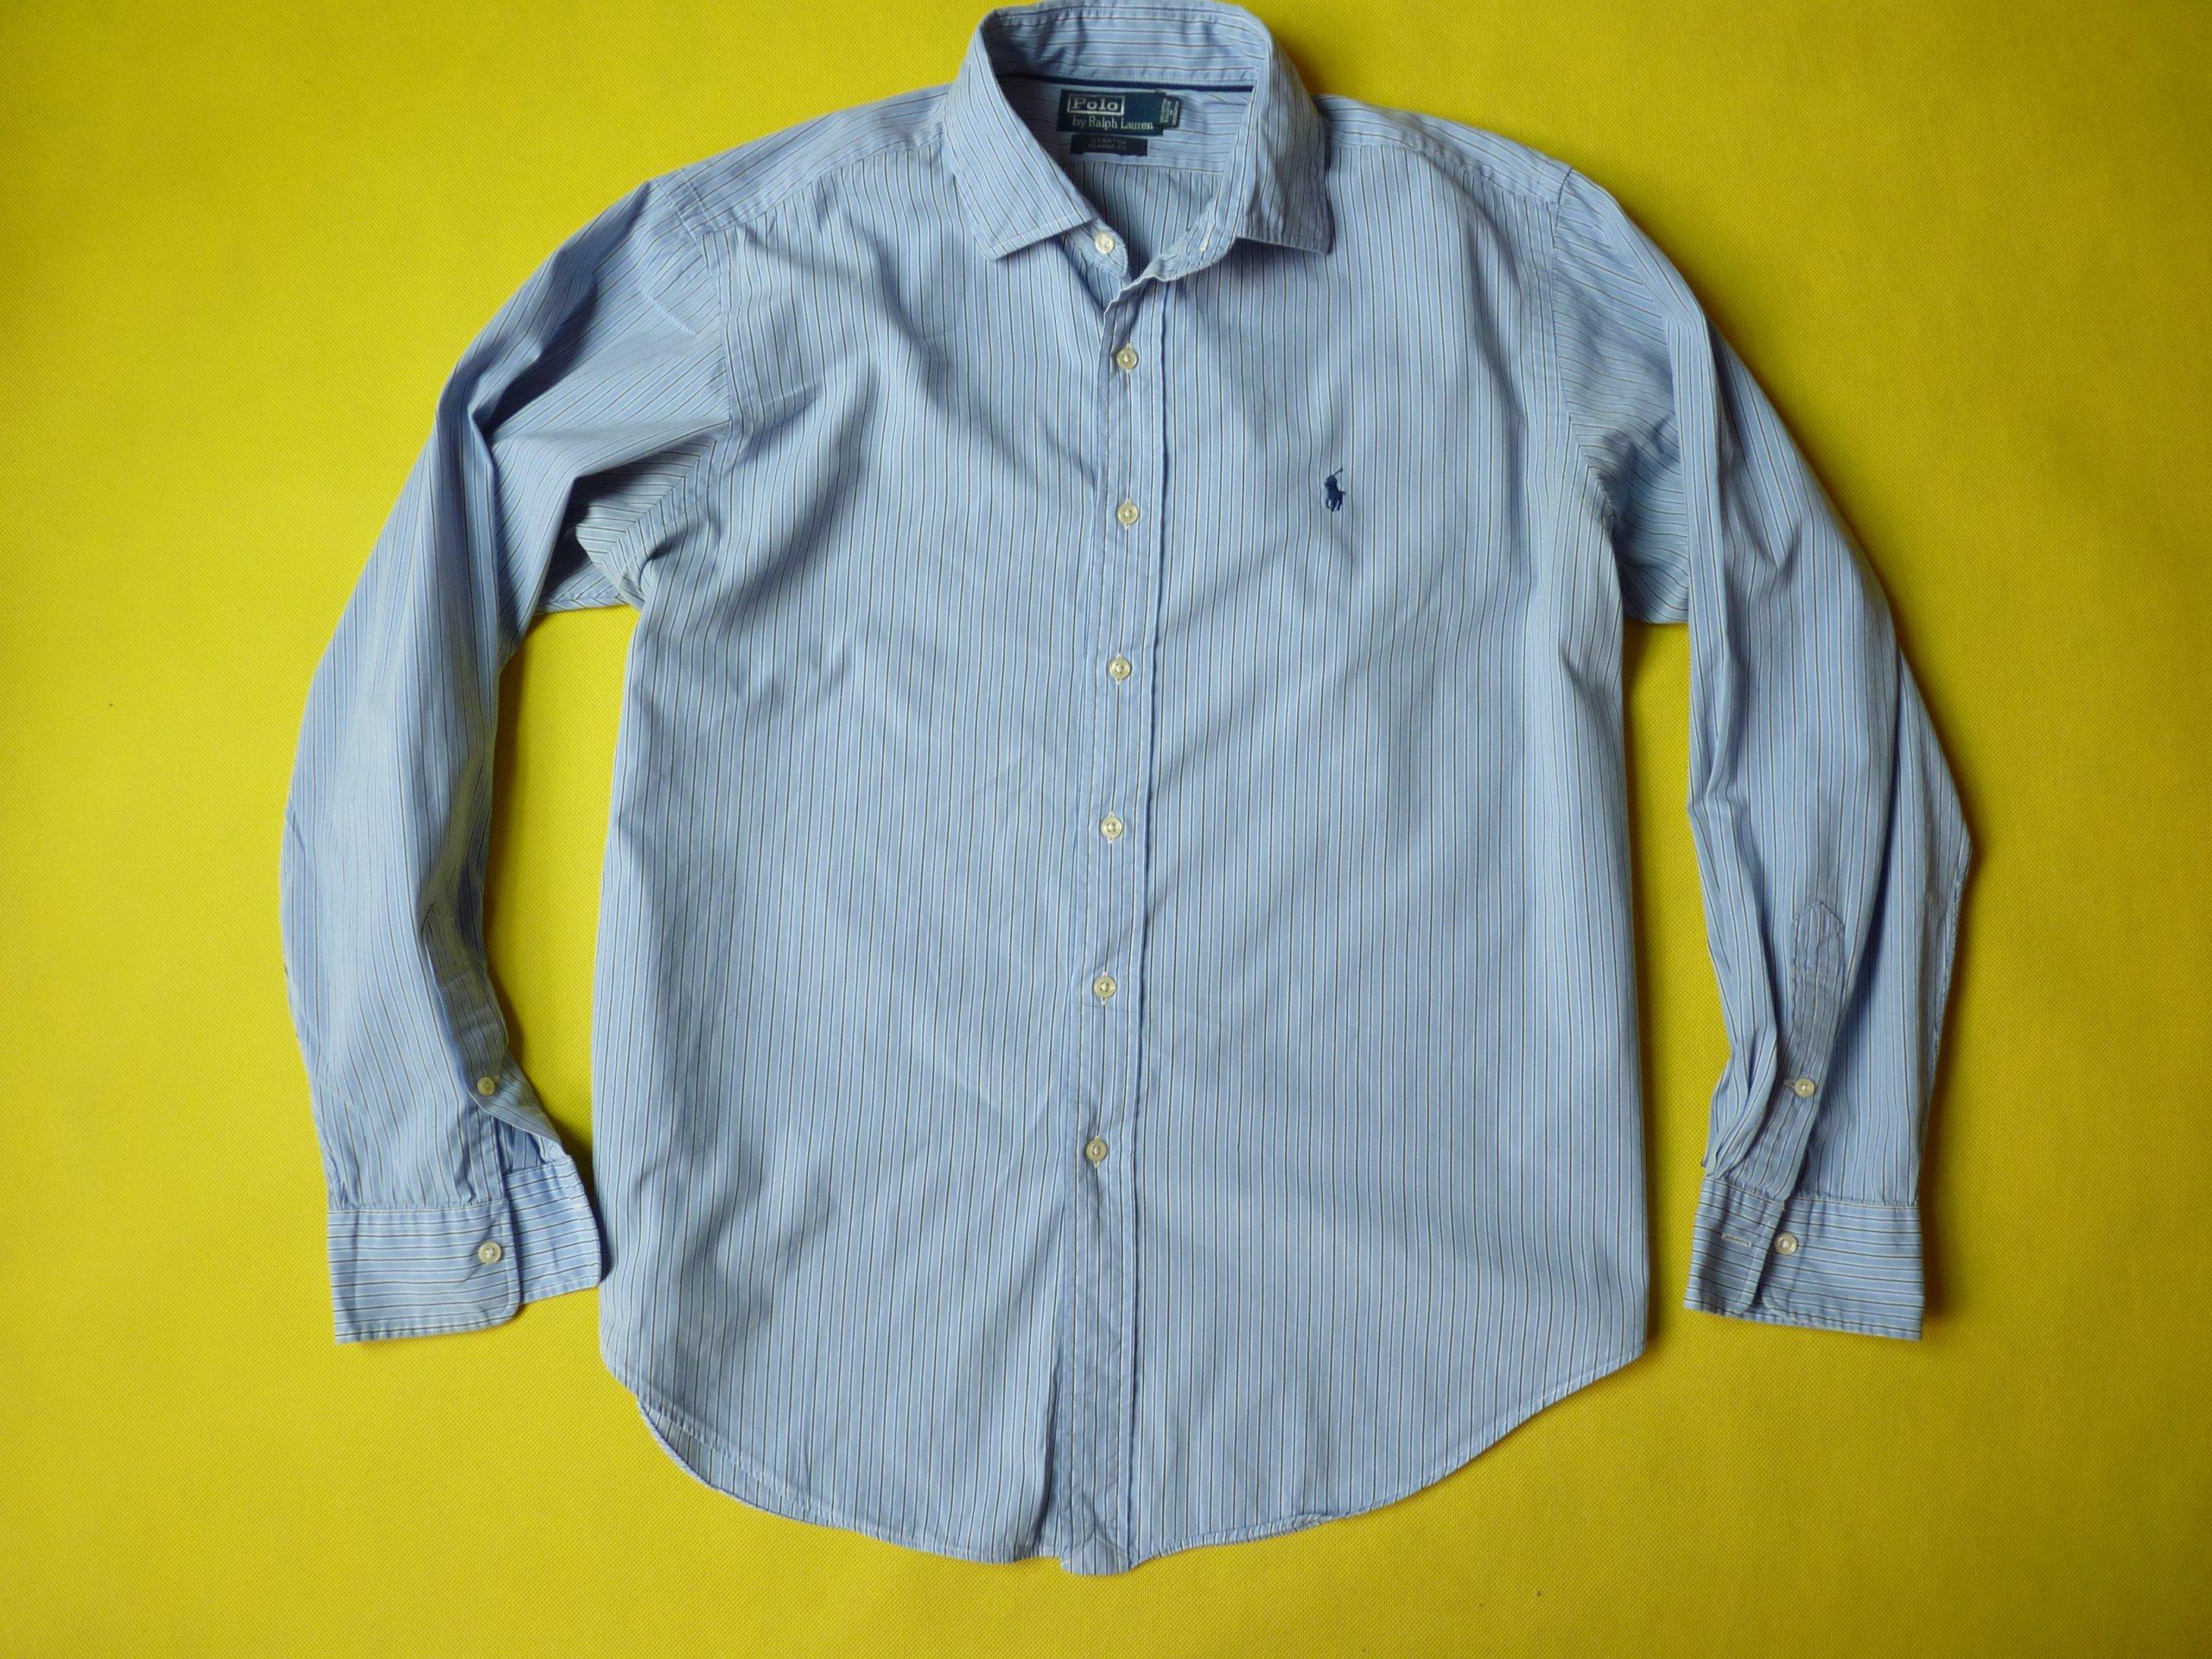 26c03b02f POLO RALPH LAUREN CLASSIC FIT koszula męska r XL - 7283697557 - oficjalne  archiwum allegro